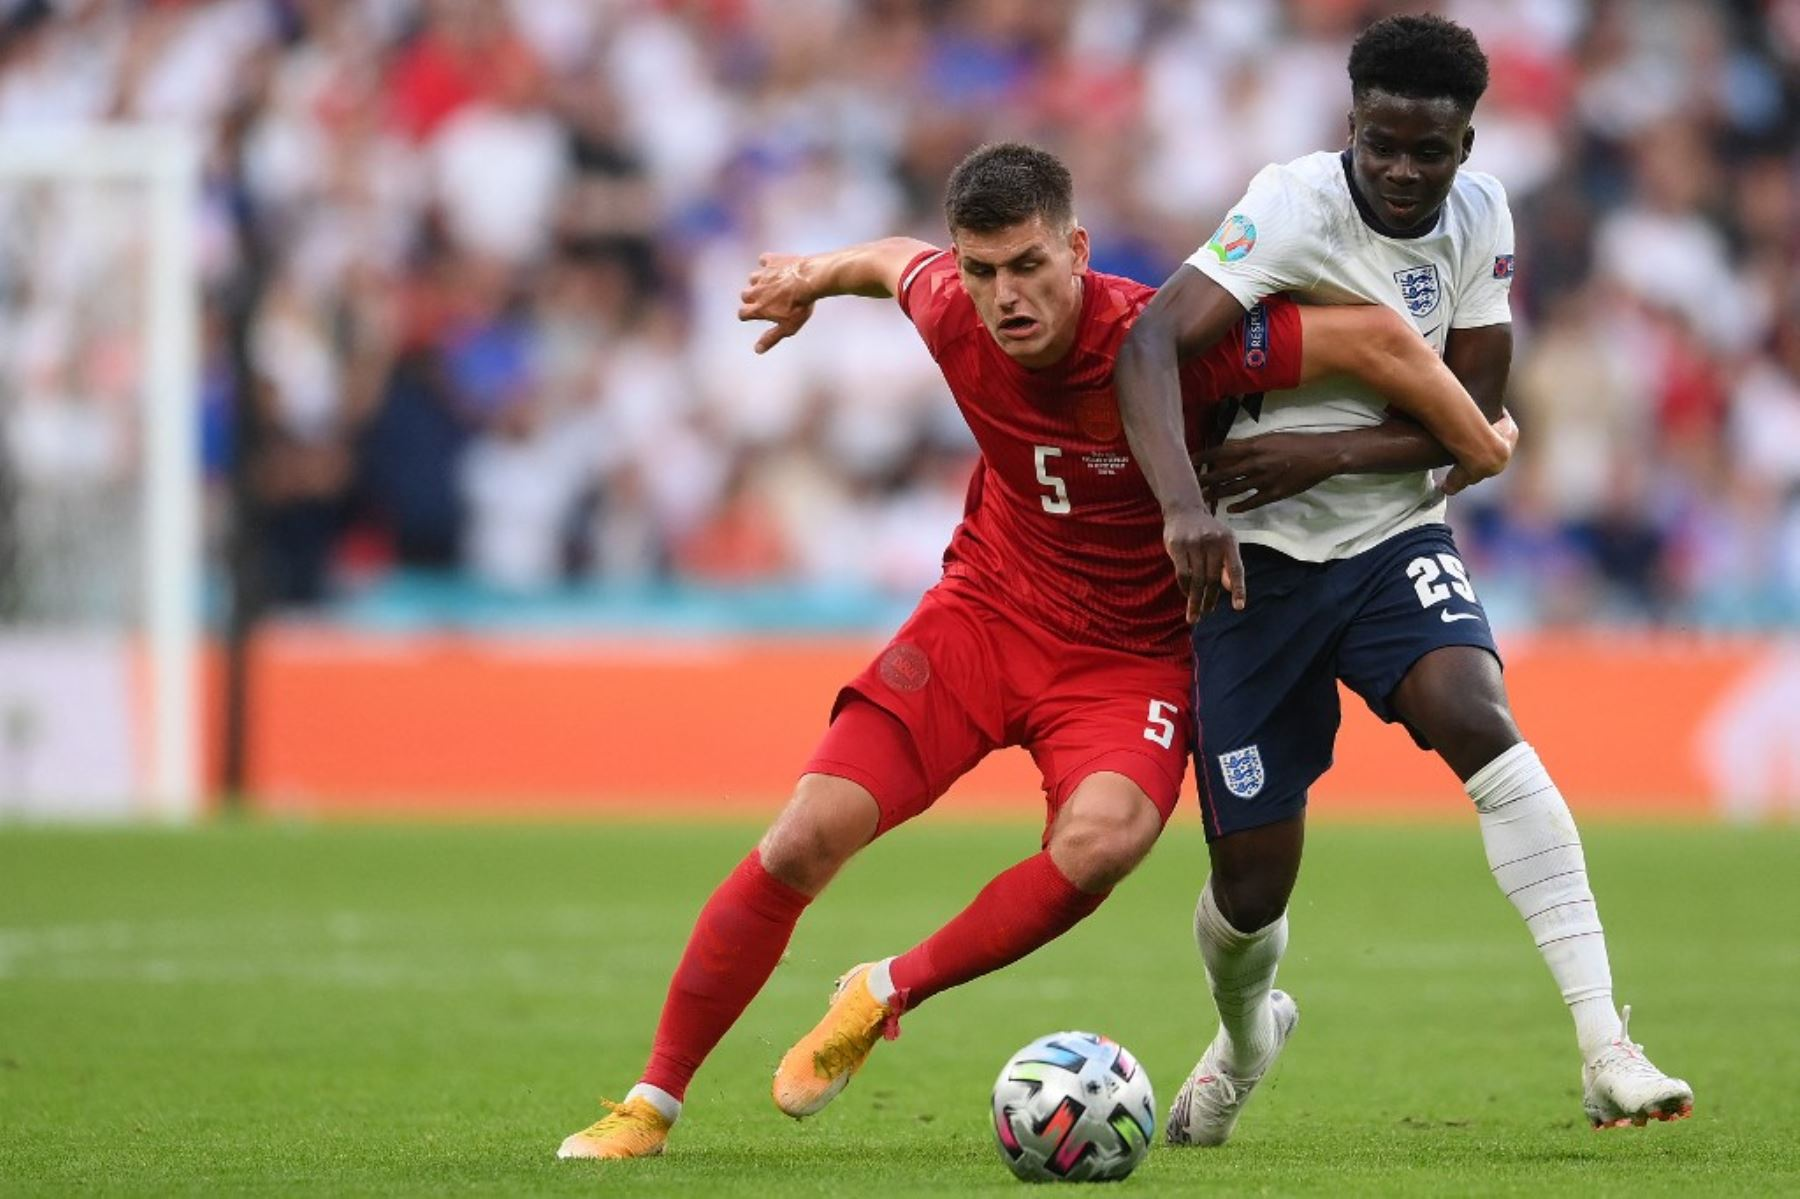 Dinamarca e Inglaterra se enfrentan por la segunda semifinal de la Eurocopa en Wembley